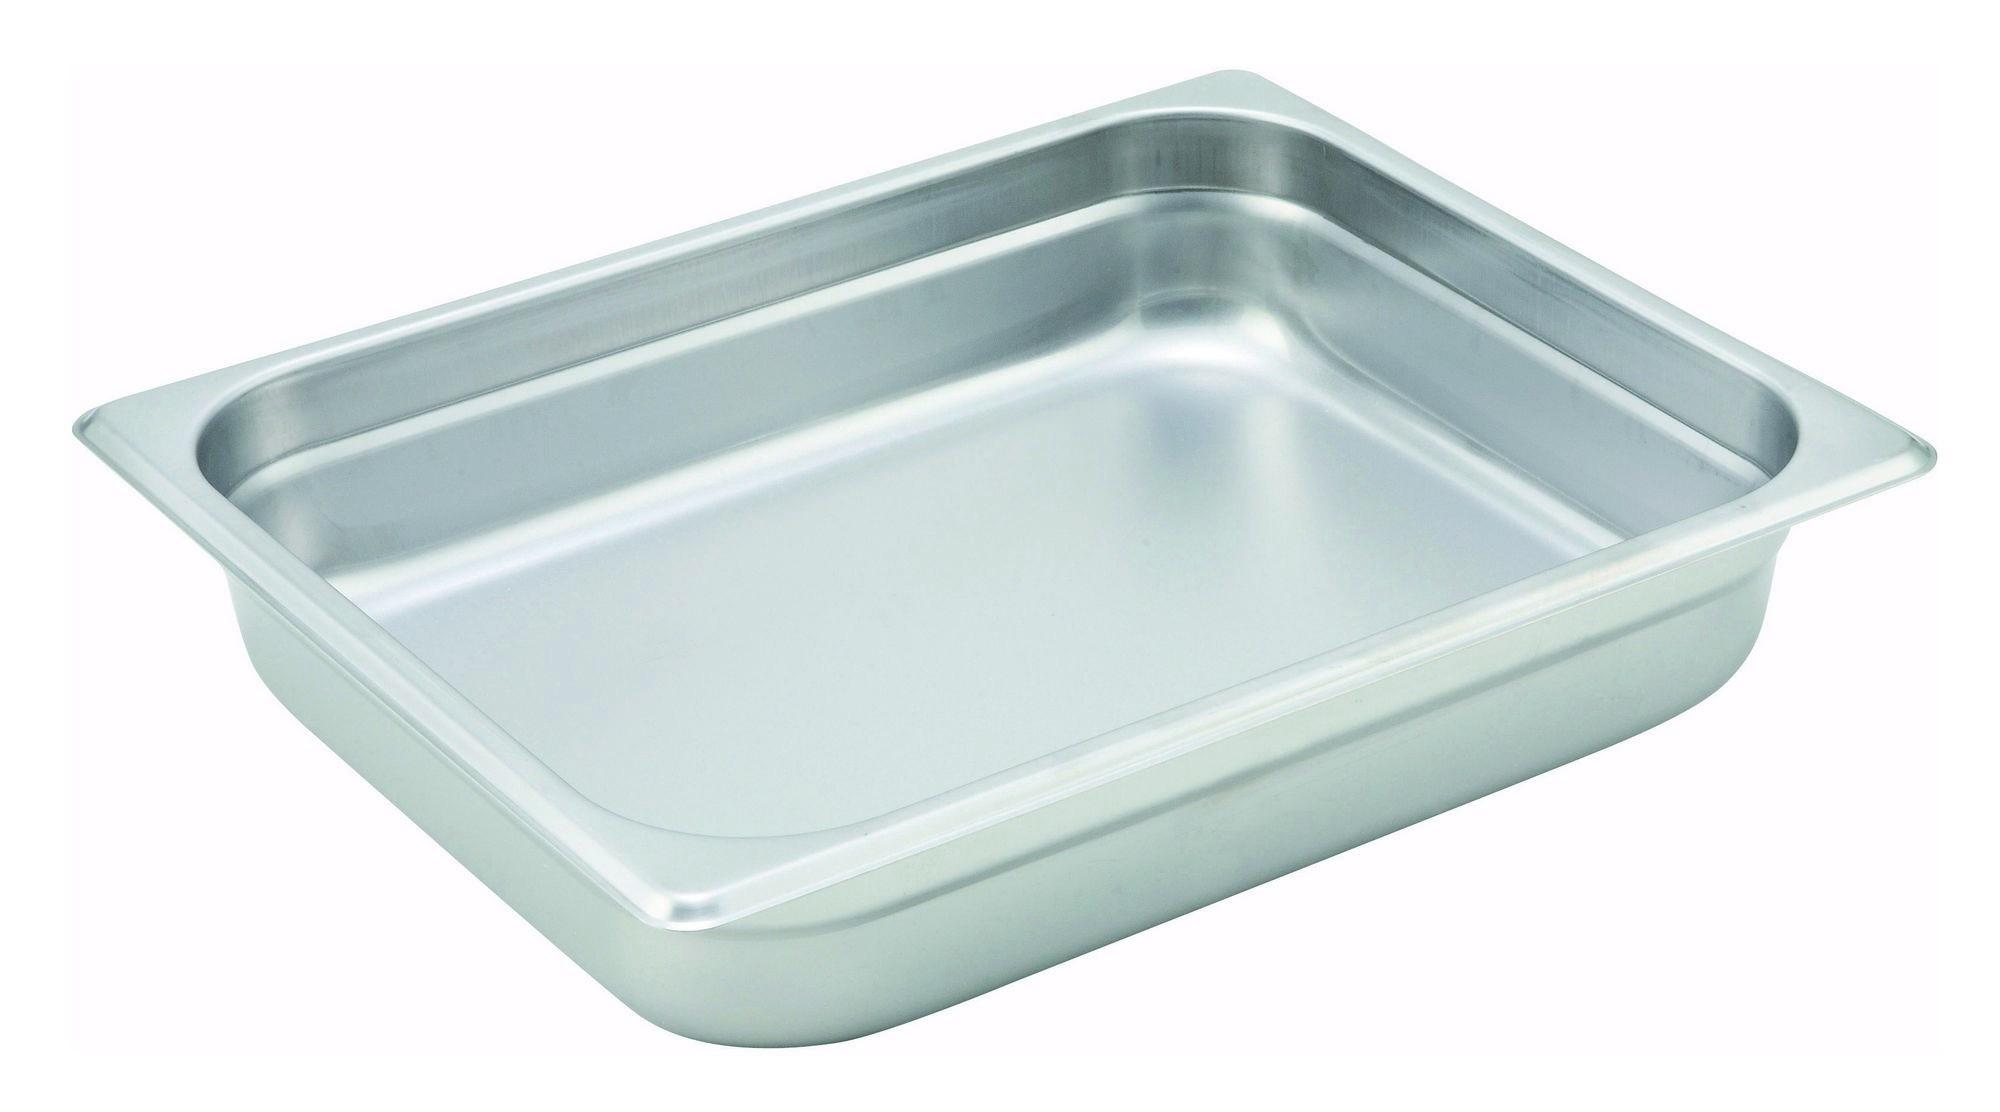 "Winco SPJH-202 1/2 Size Anti-Jam 22 Gauge Steam Table Pan 2-1/2"" Deep"